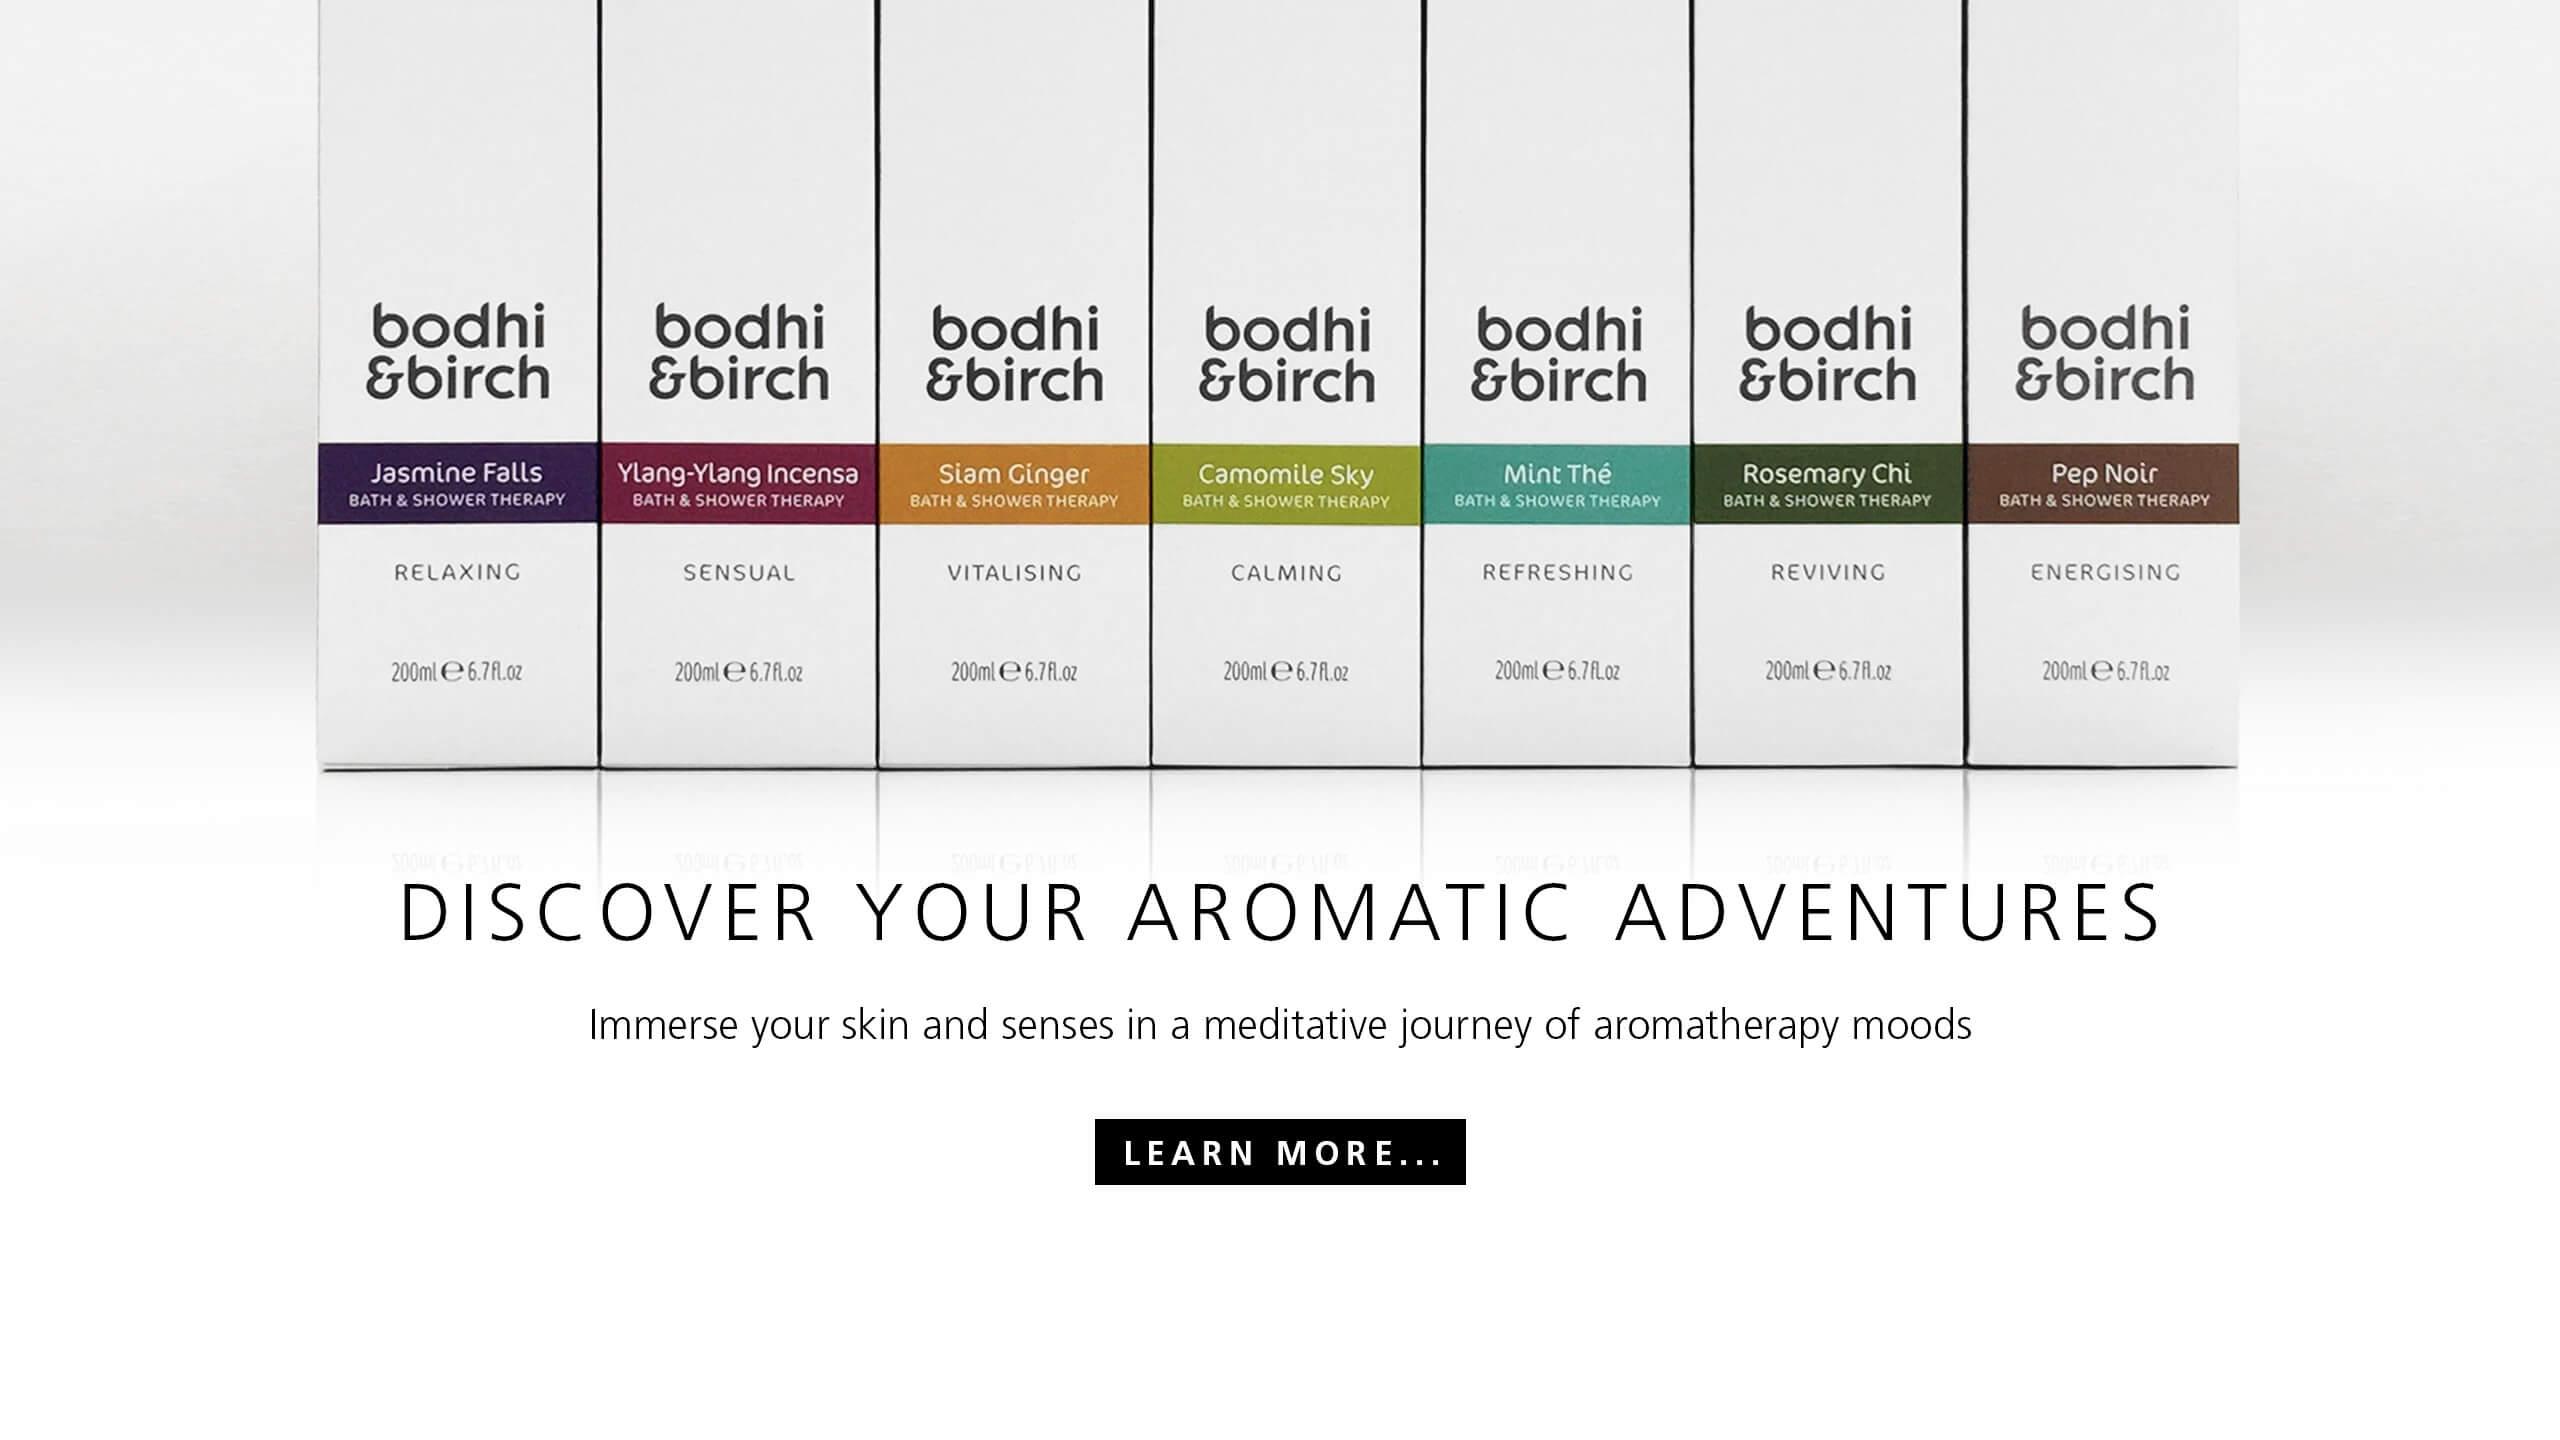 Aromatic Adventures